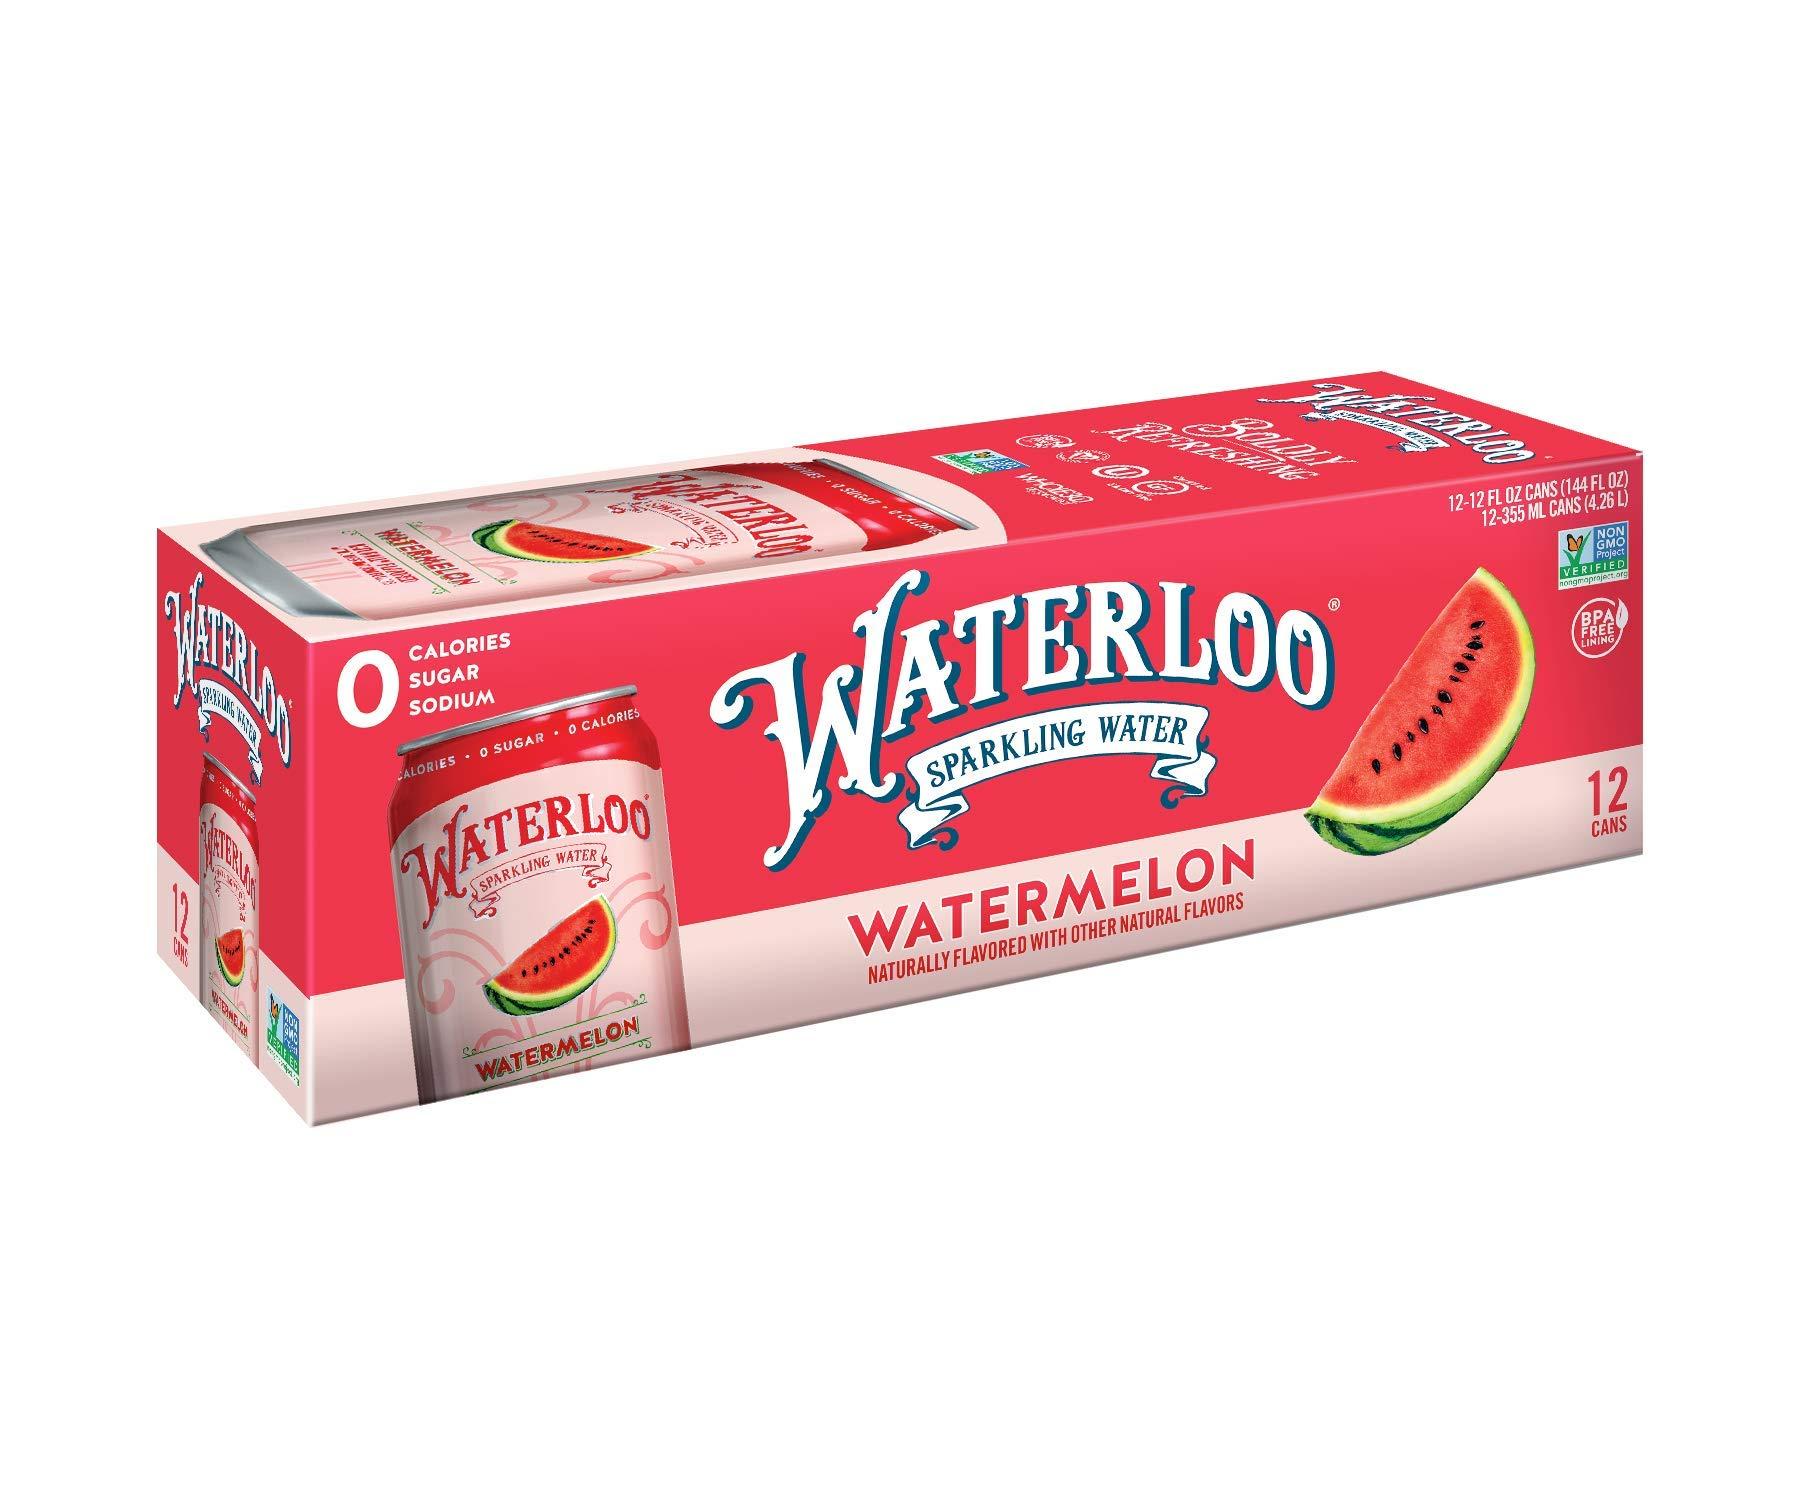 Waterloo Sparkling Water Watermelon Flavor Zero Calorie No Sugar 12oz Cans (Pack of 12), Fruit Flavored Sparkling Water, Naturally Flavored, Zero Calories, Zero Sugar, Zero Sodium